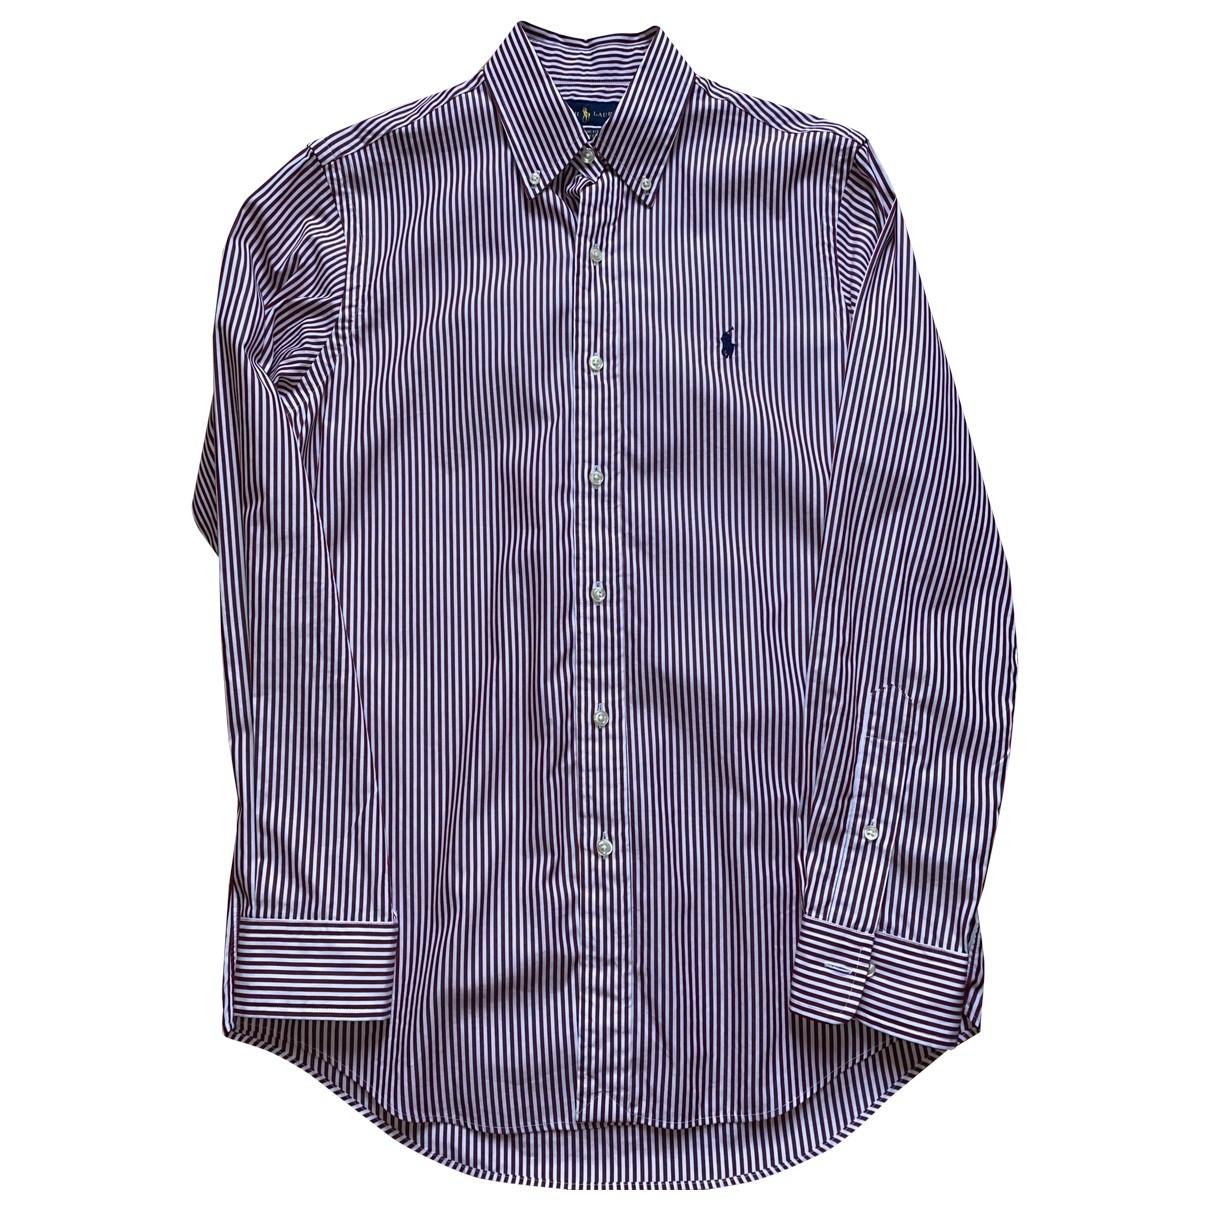 Ralph Lauren \N Red Cotton Shirts for Men S International